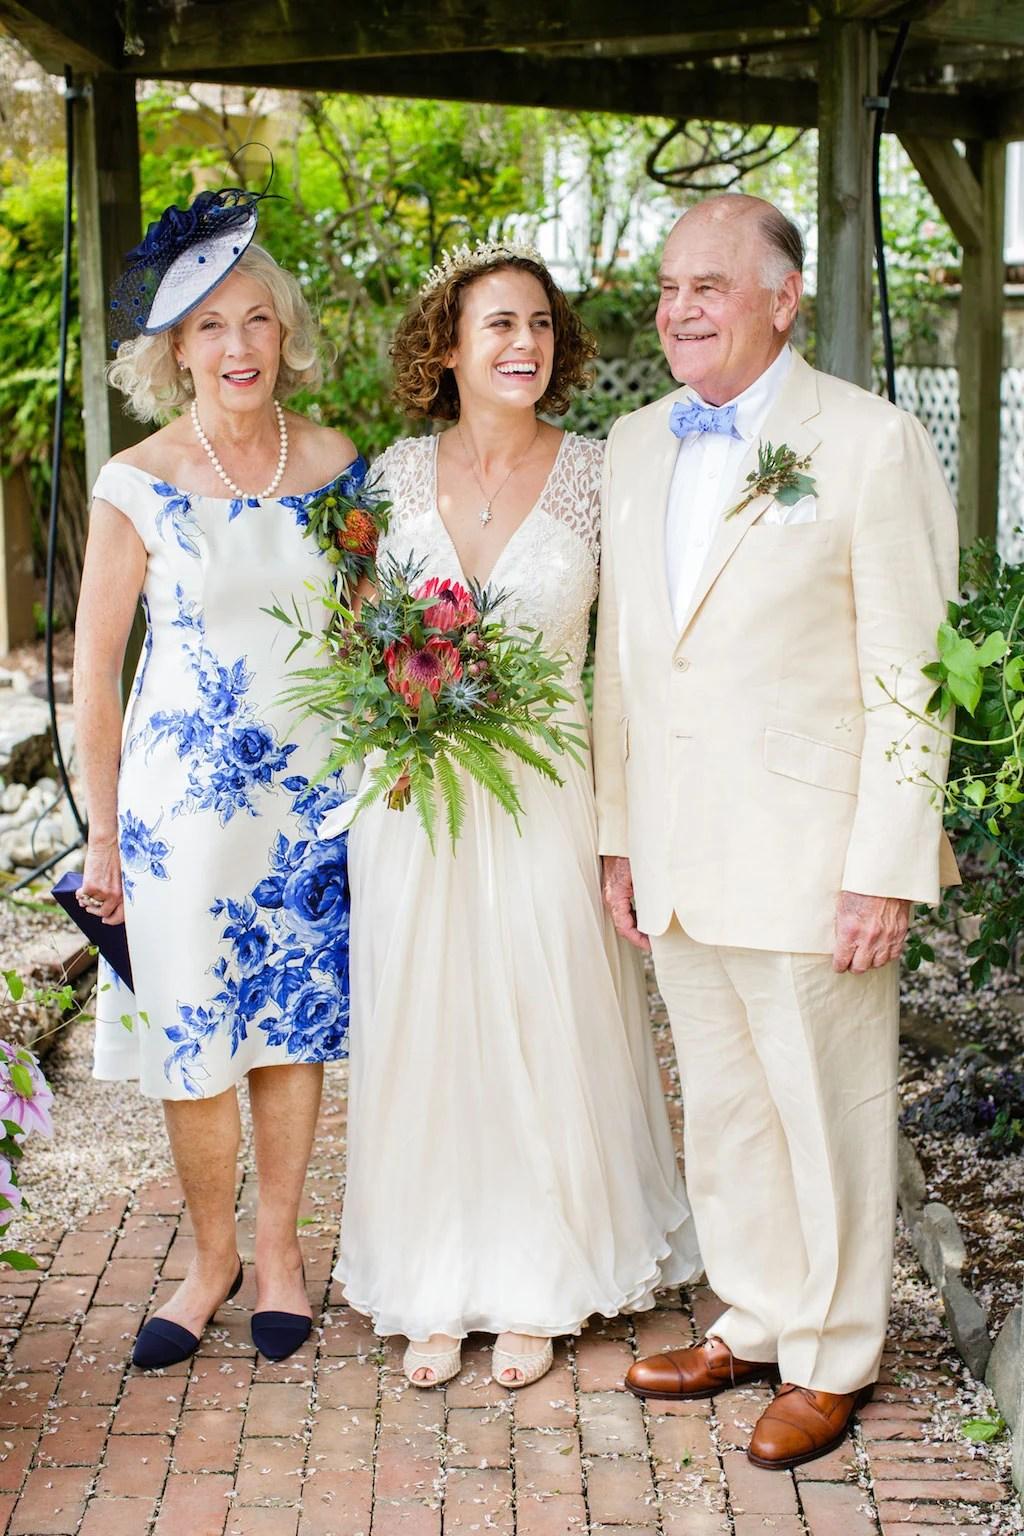 Tanzania Meets Maryland S Eastern Shore In This Insanely Fun Wedding Washingtonian Dc